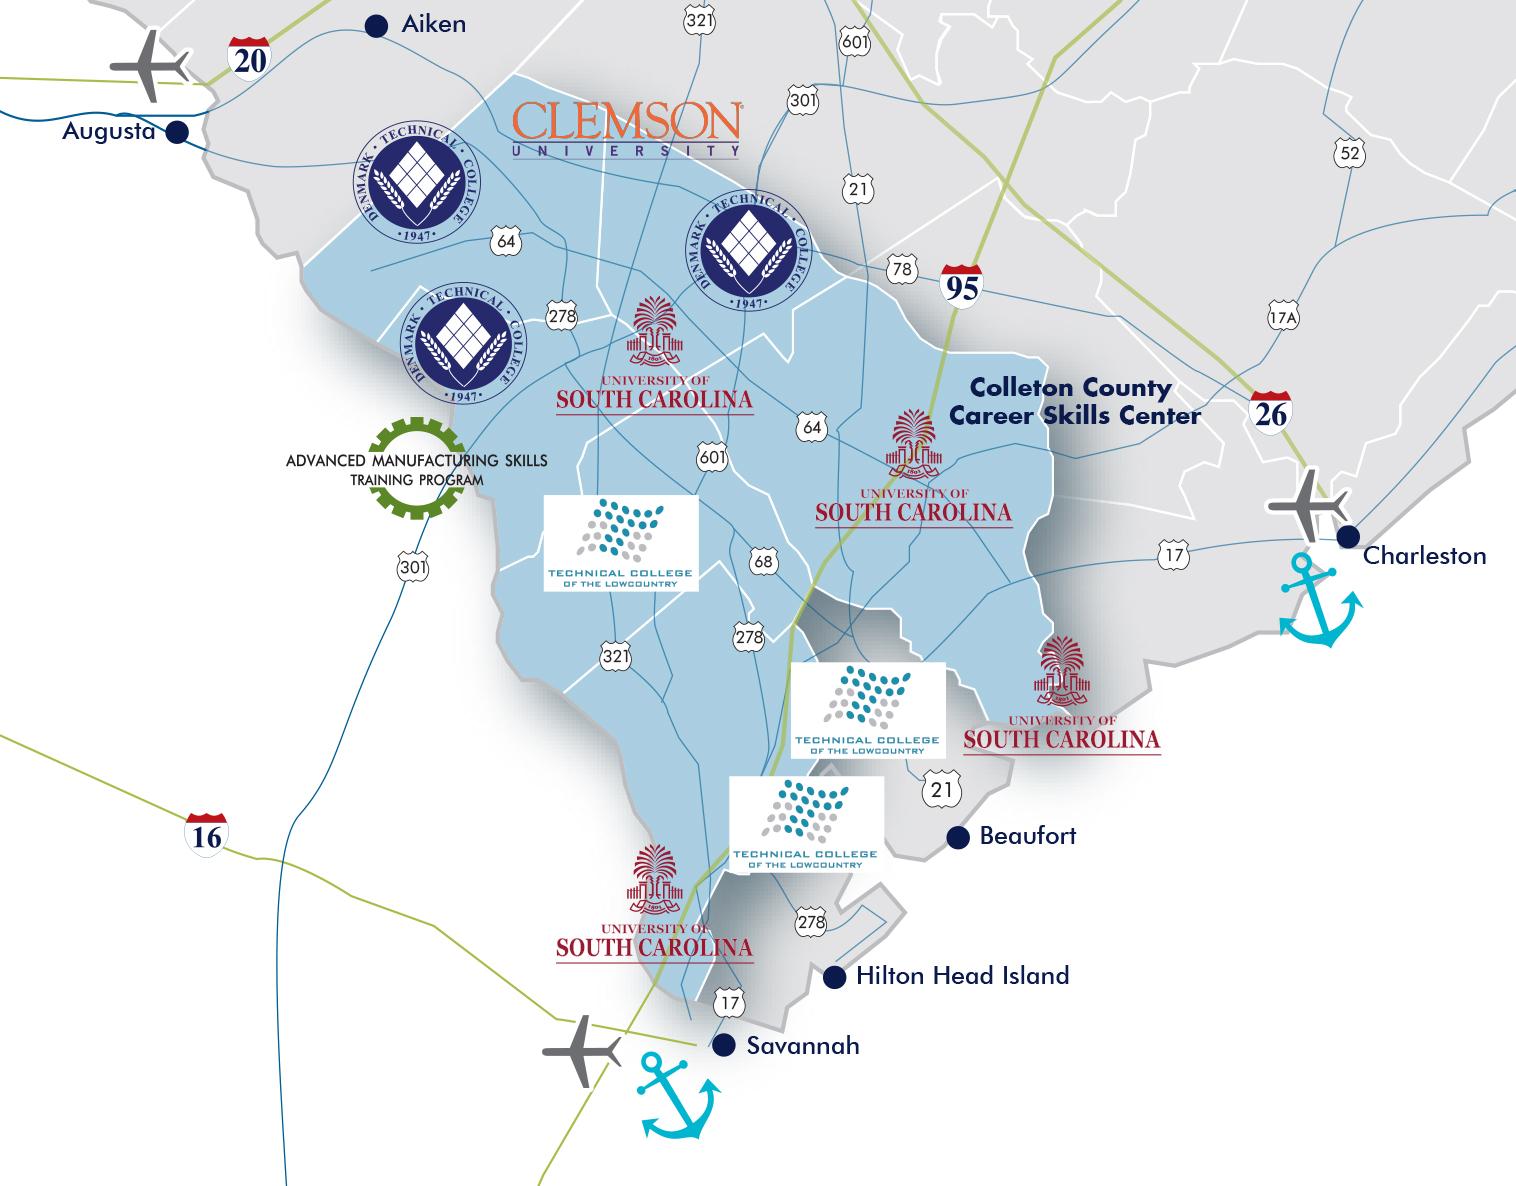 Southern Carolina Regional Development Alliance